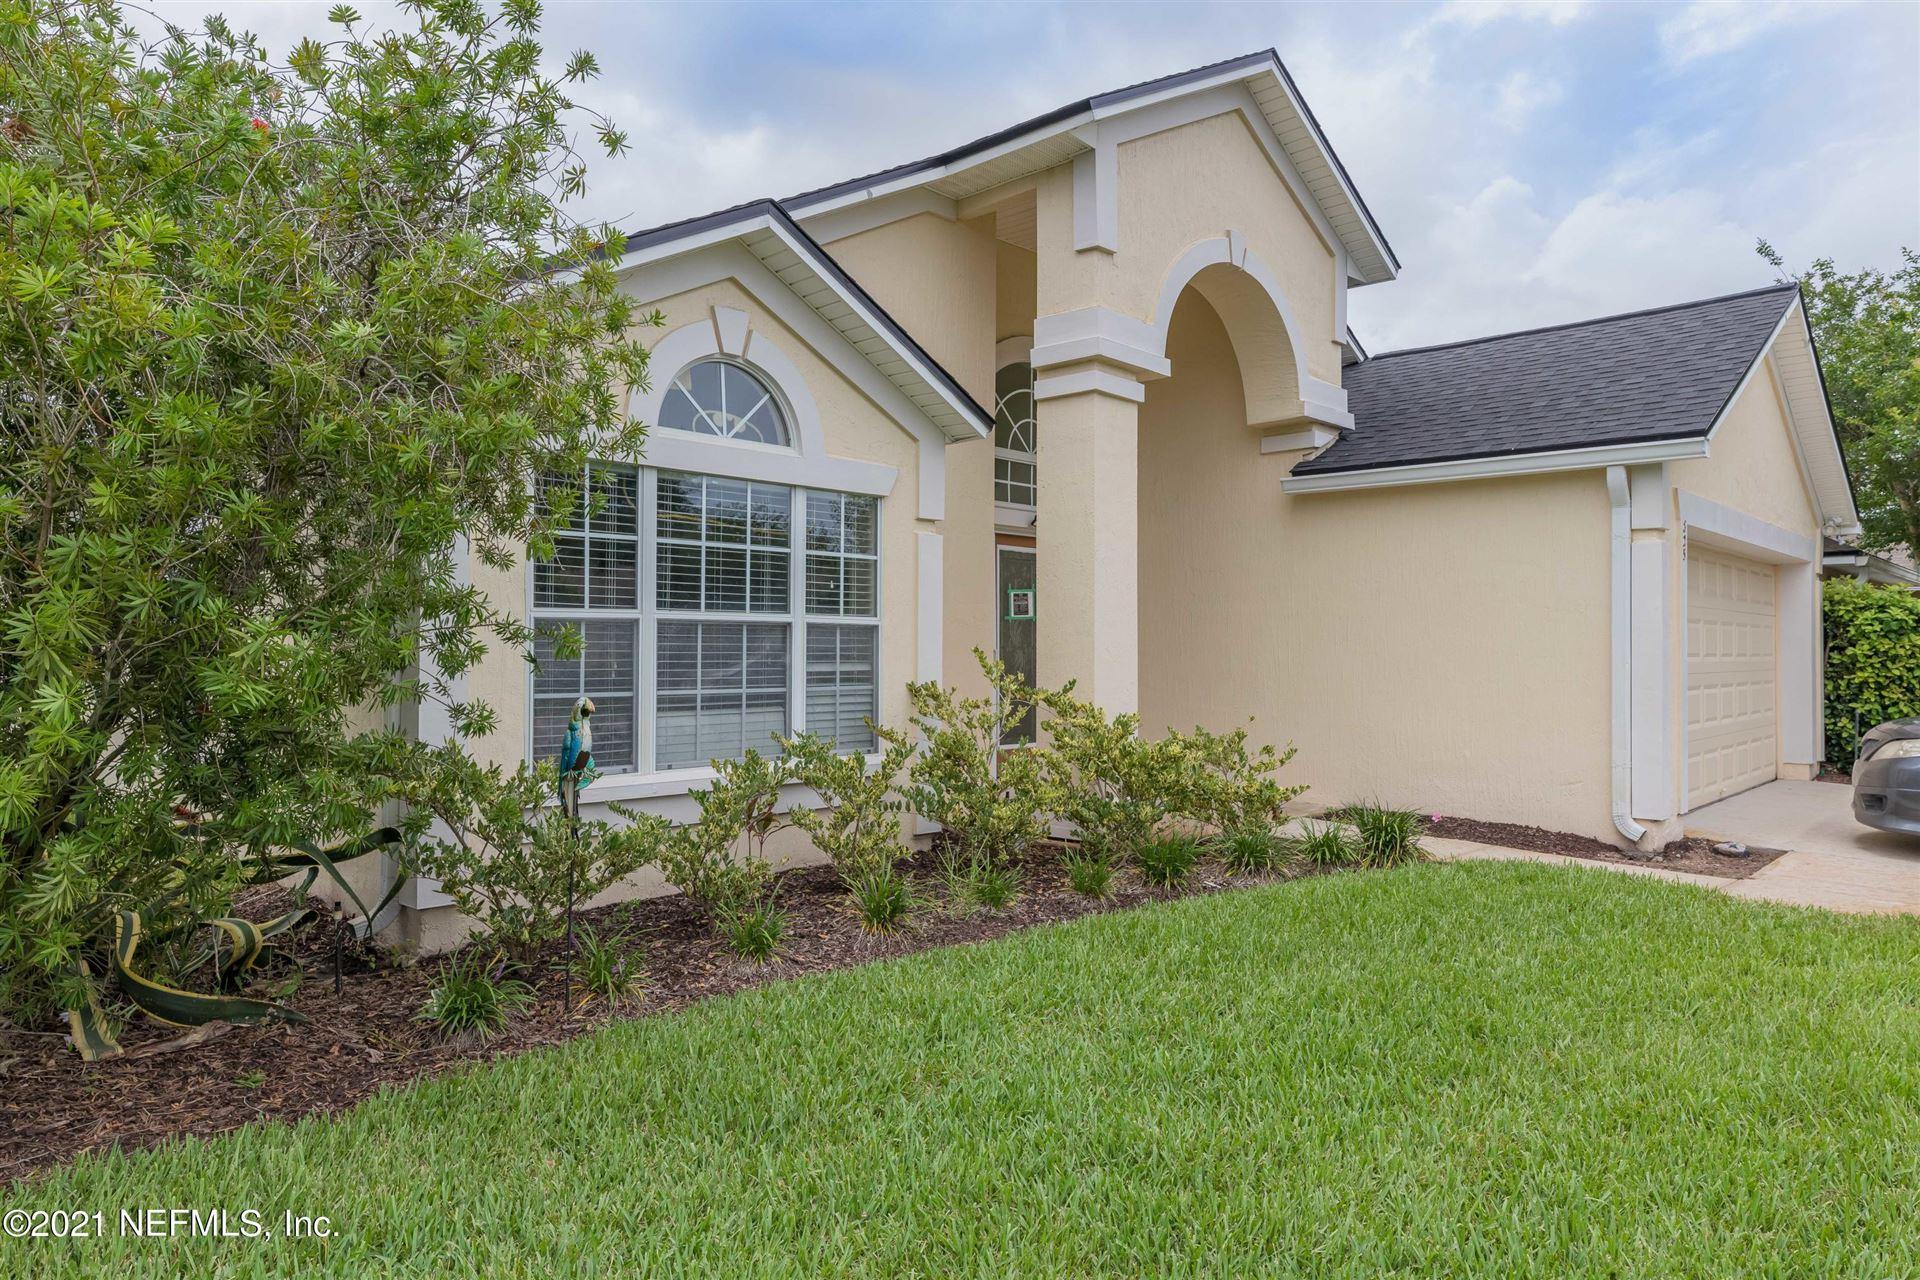 825 OAK ARBOR CIR, Saint Augustine, FL 32084 - MLS#: 1119799